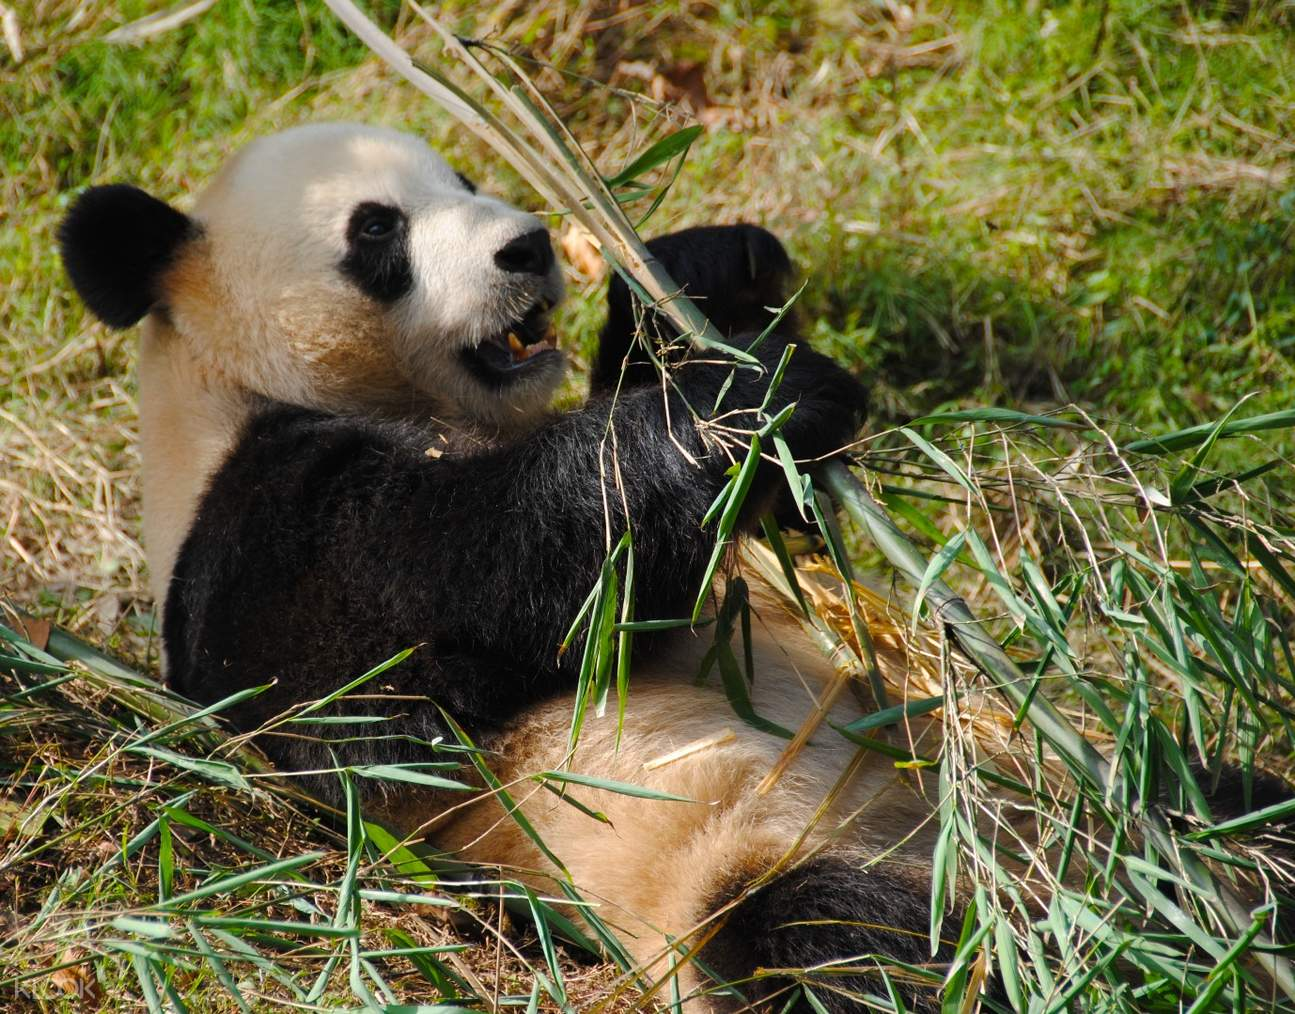 Dujiangyan Panda Keeper Experience